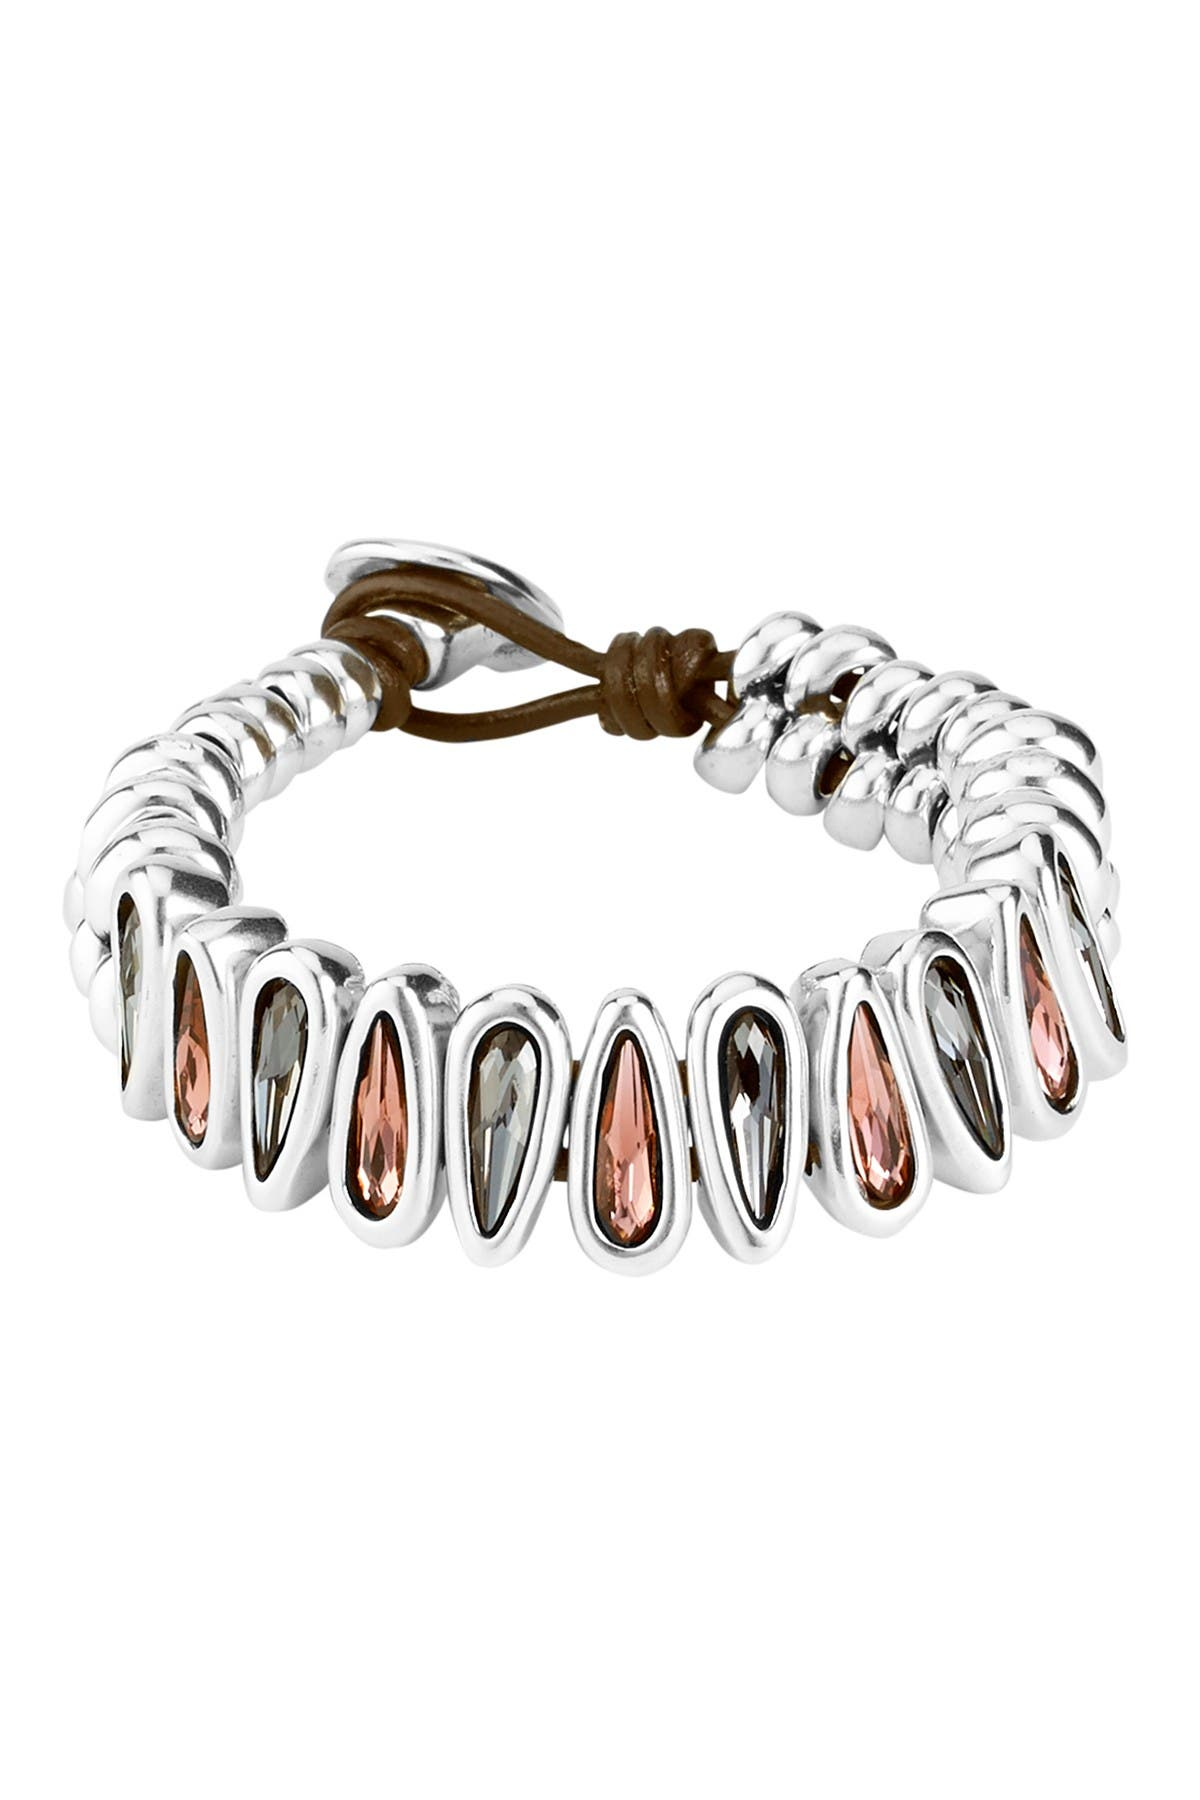 Image of Uno De 50 Follow You Bracelet